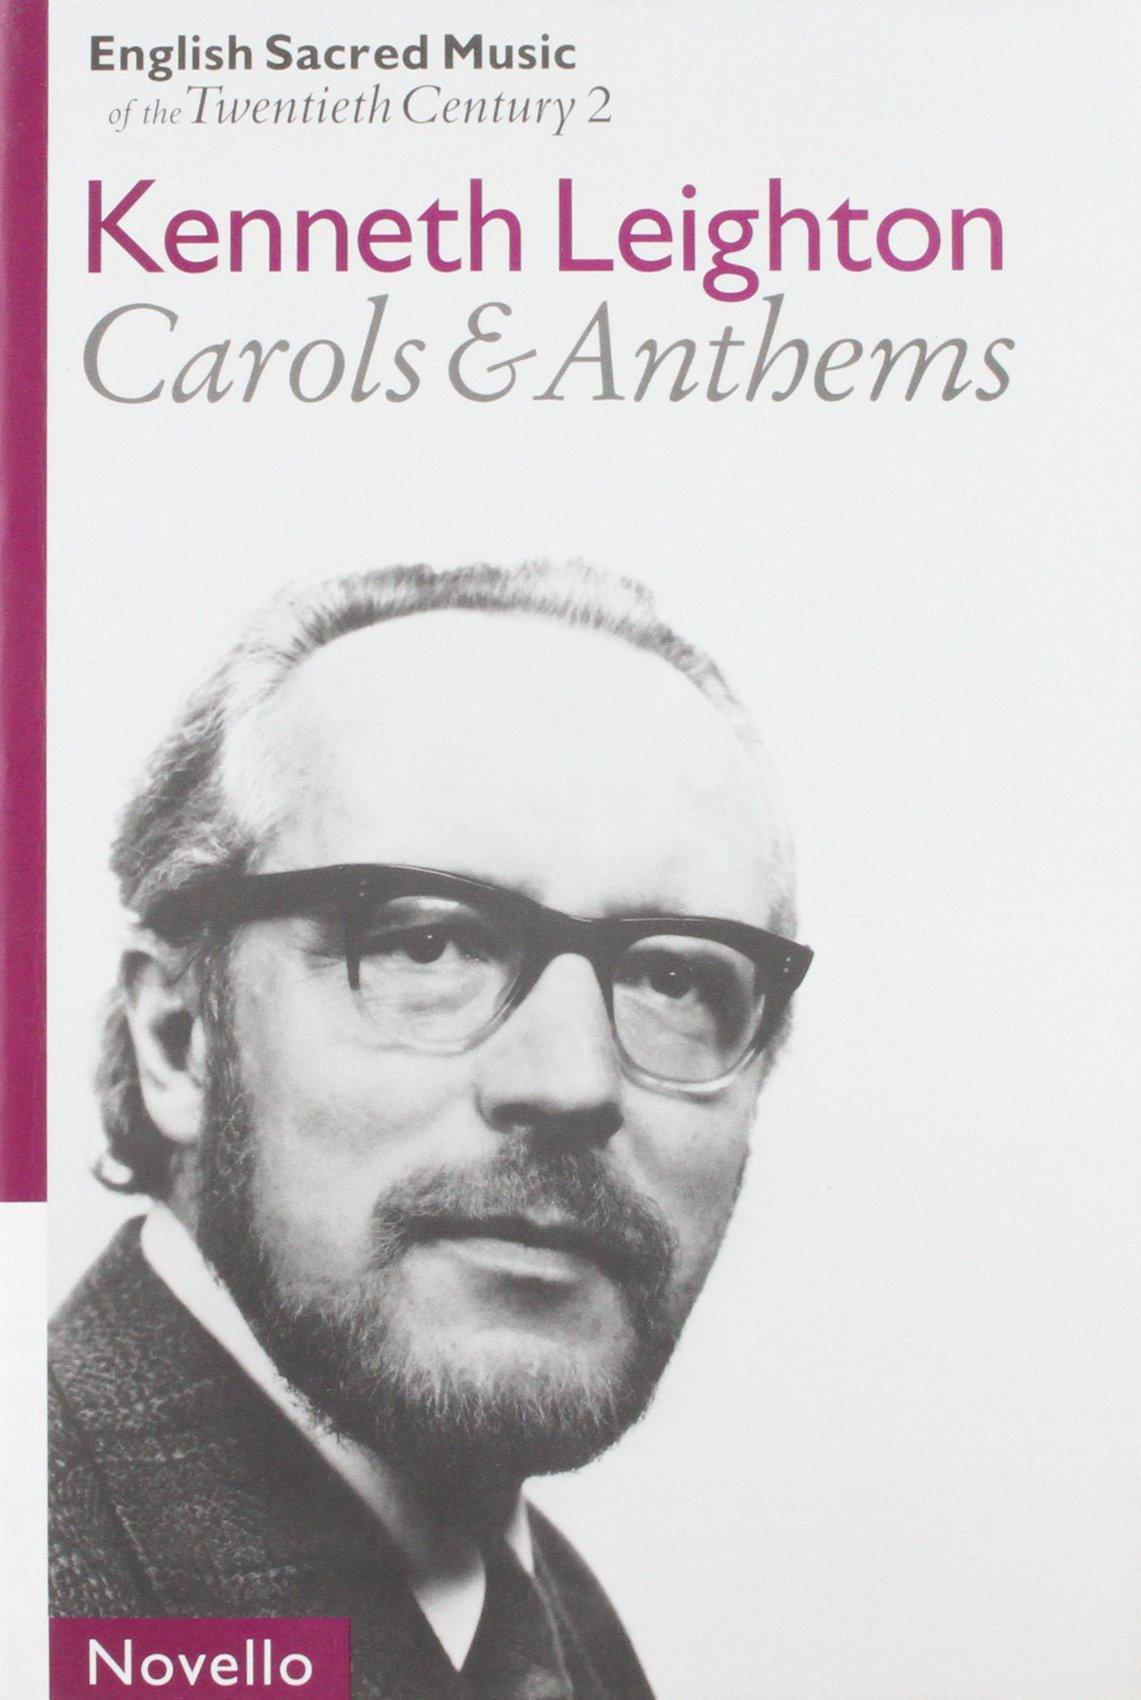 Download CAROLS & ANTHEMS ENGLISH     SACRED MUSIC OF THE TWENTIETH CENTURY 2 ebook